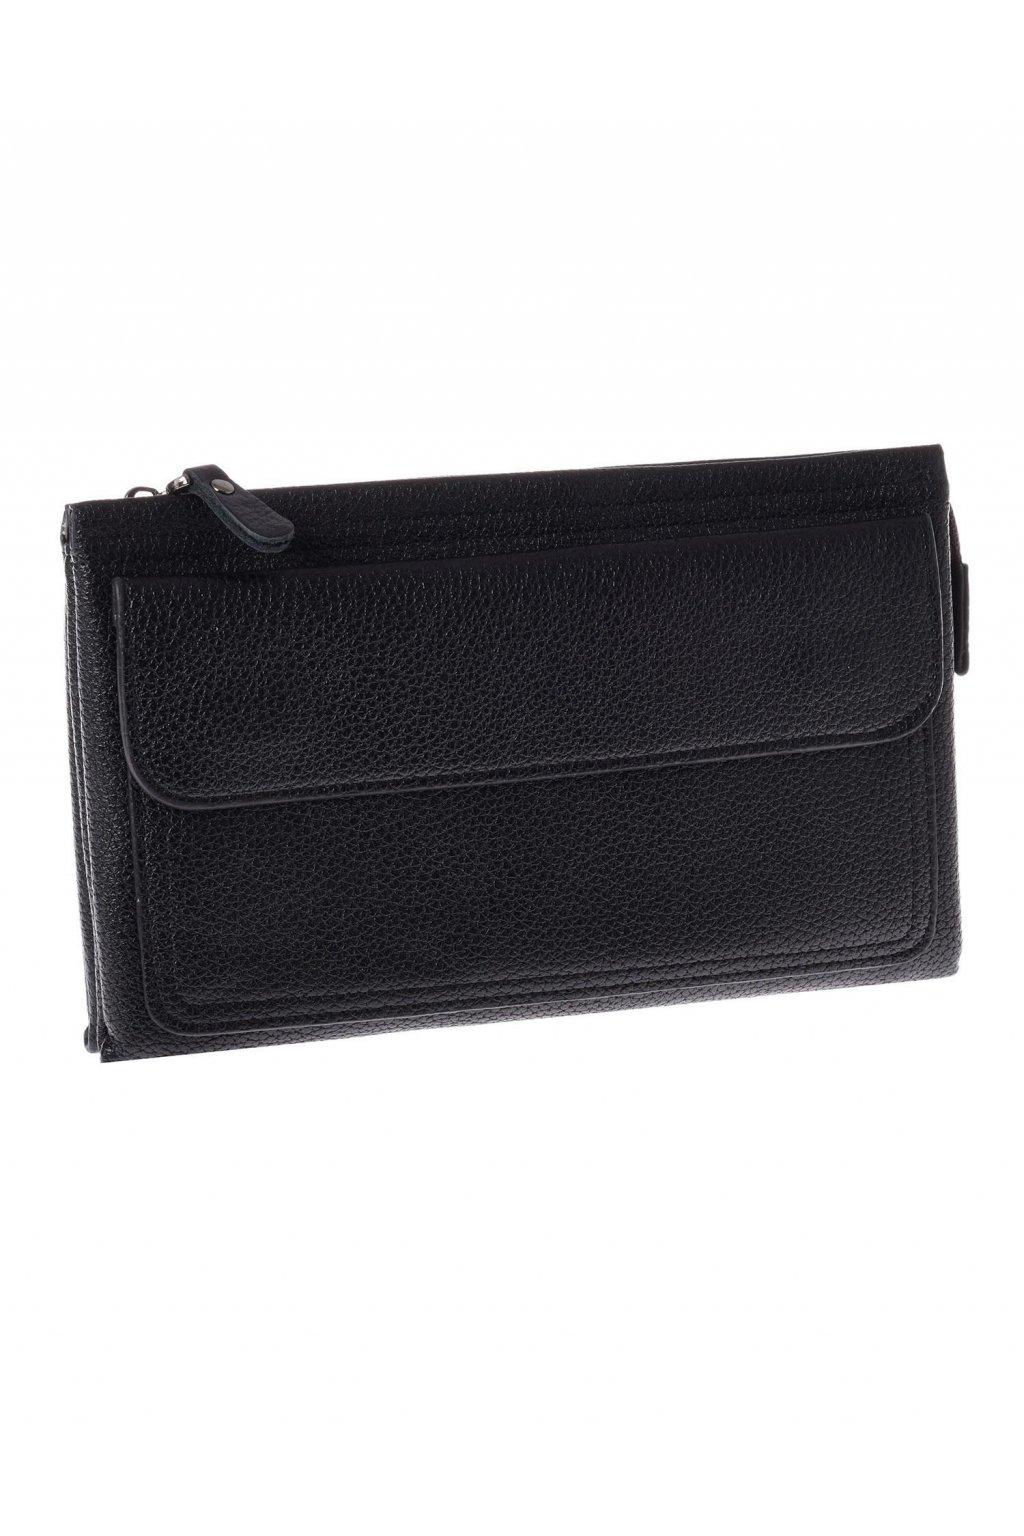 Peňaženka kód CE-PR-SF-1813.08